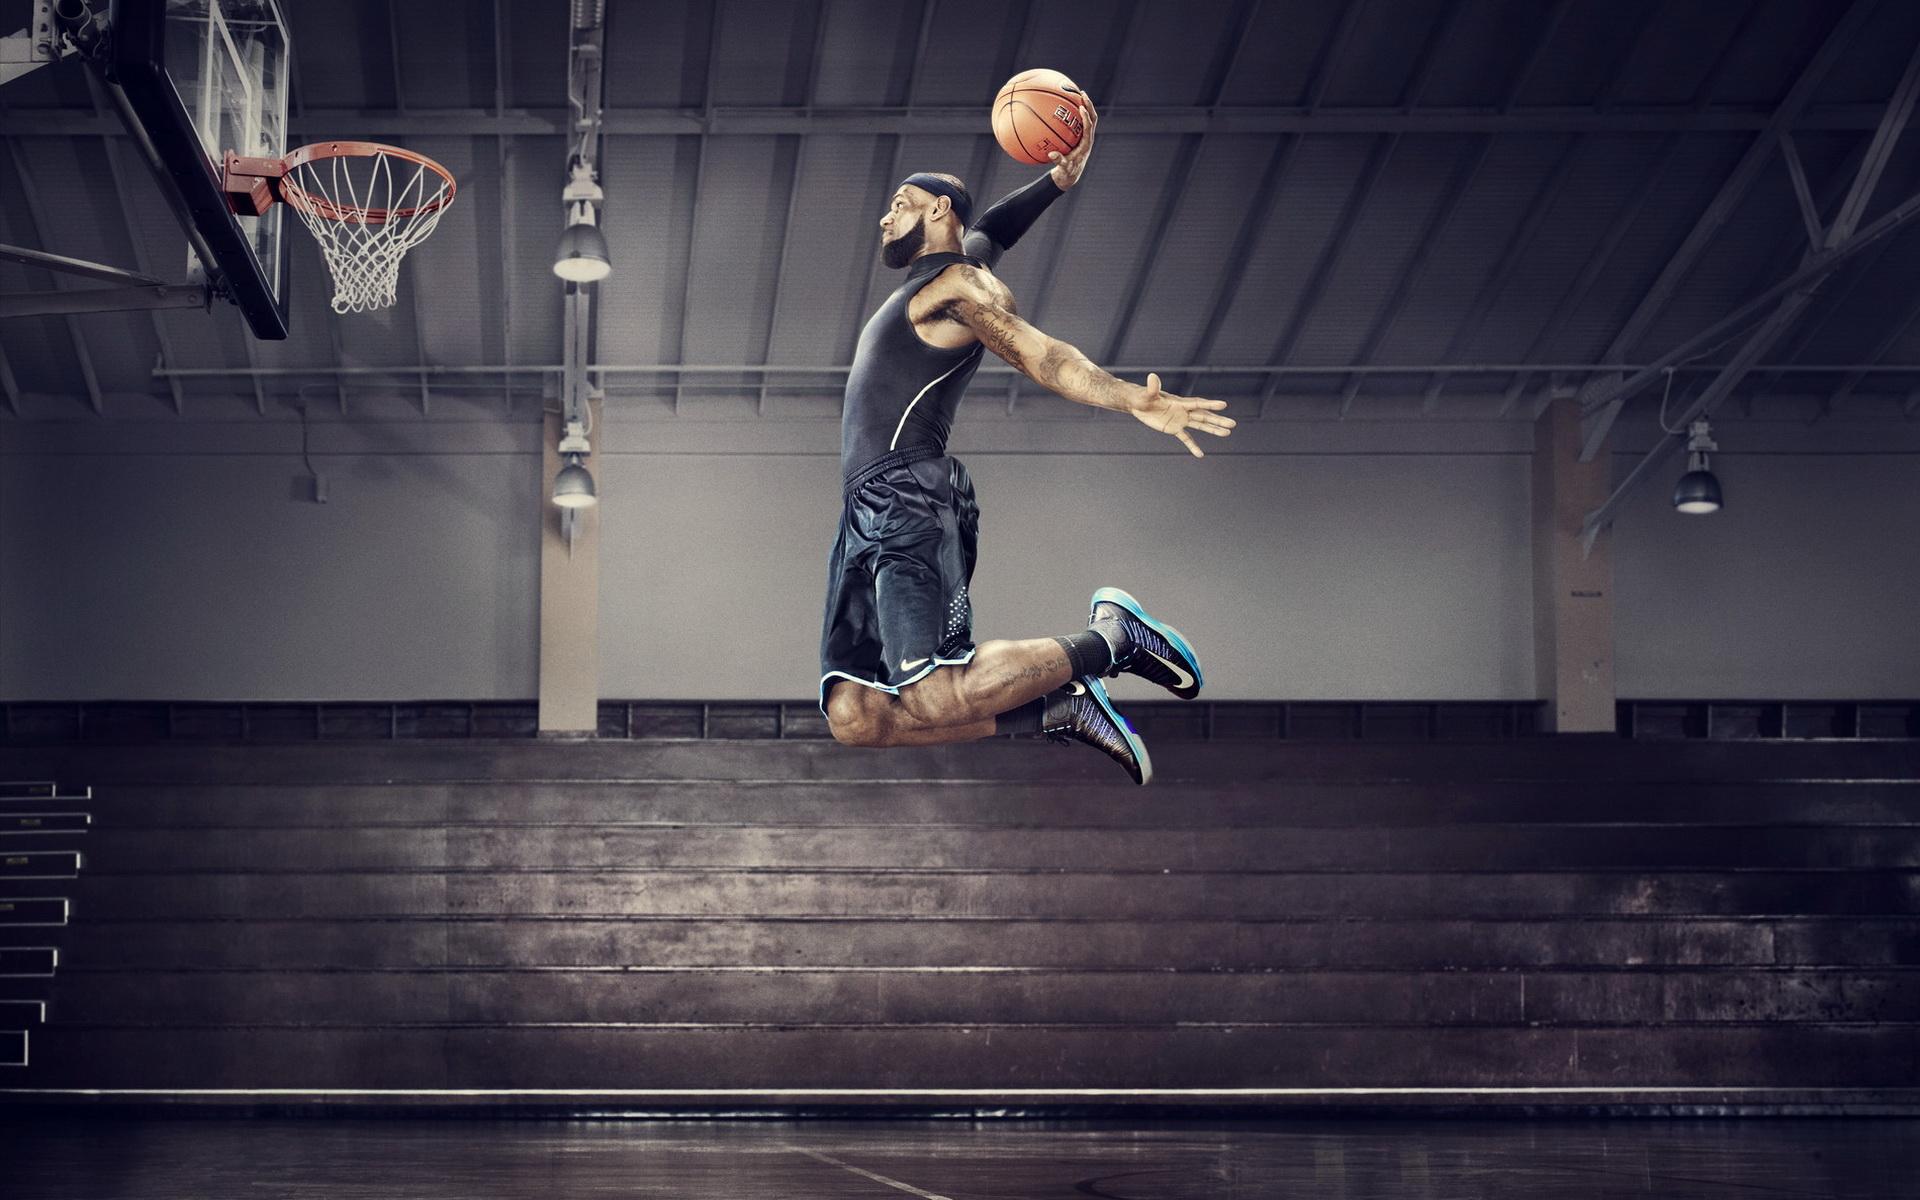 лучшие картинки крутые картинки на аву баскетбол камни это